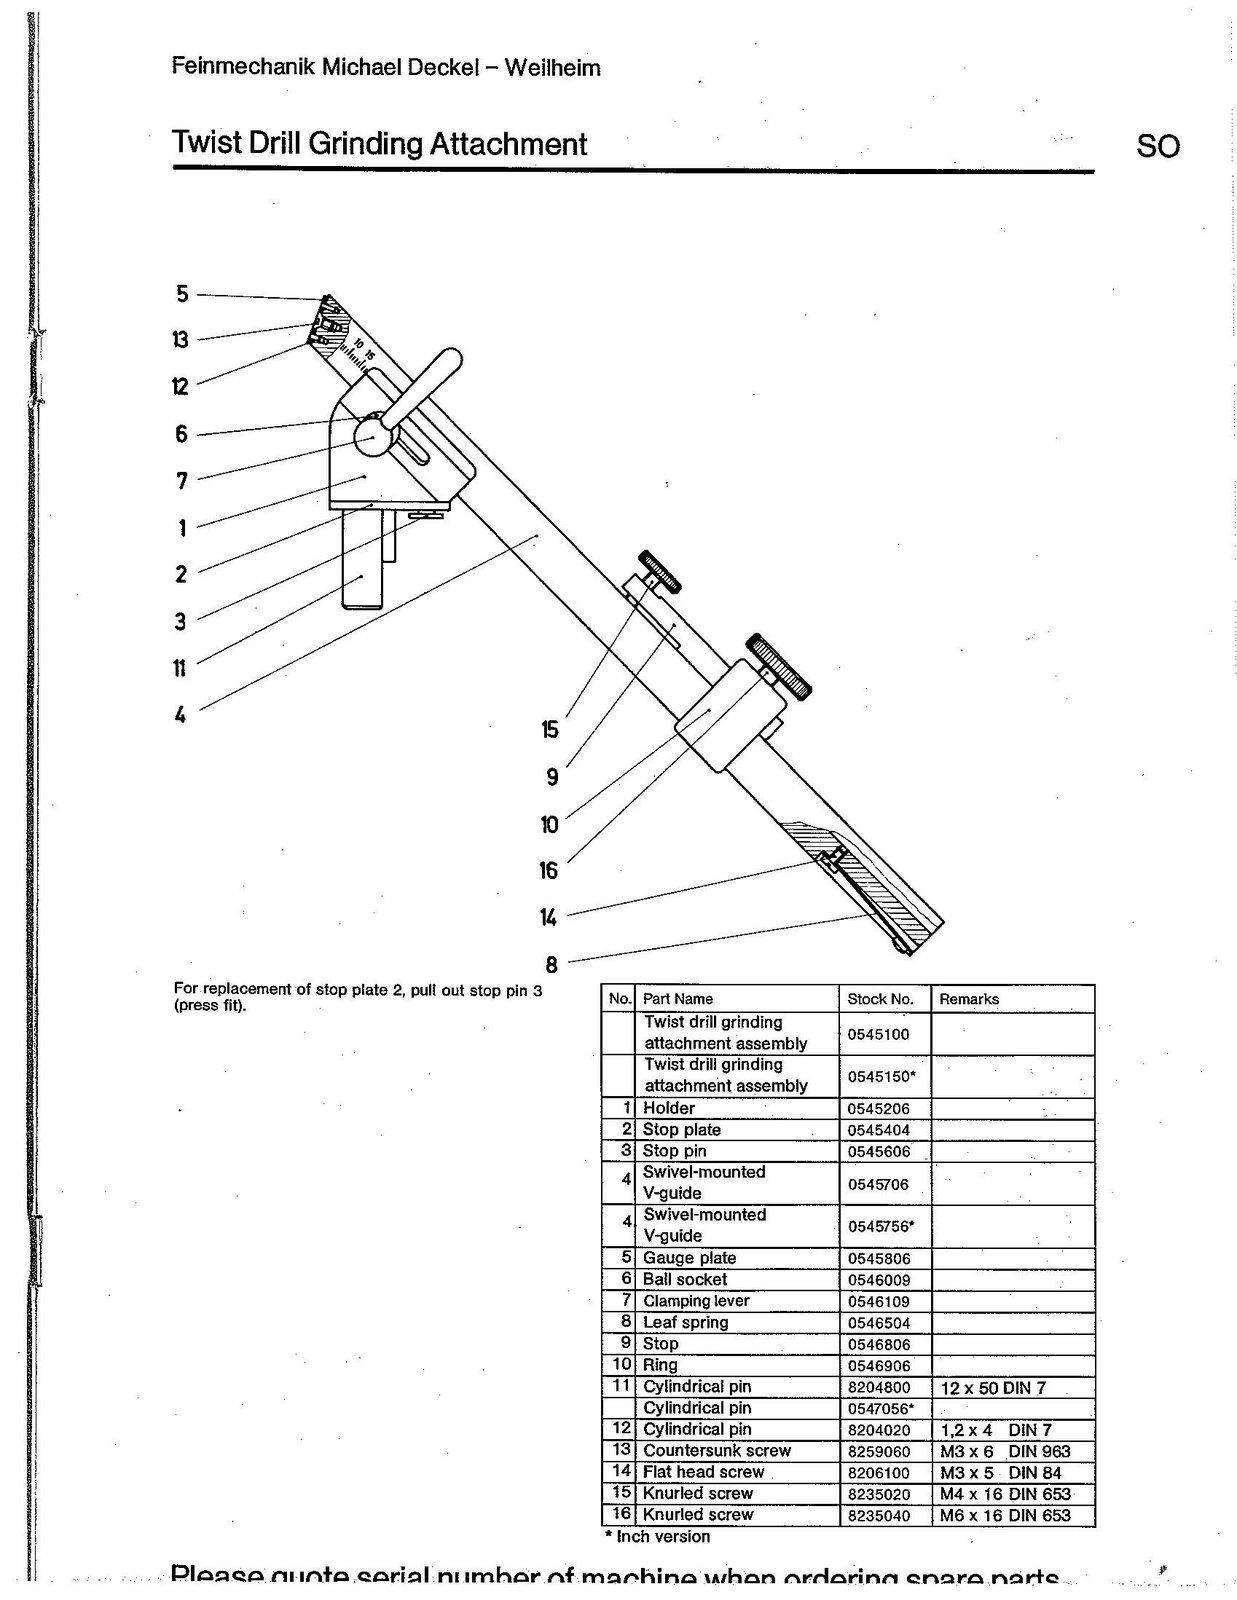 Twist Drill Grinding Attachment 1.JPG